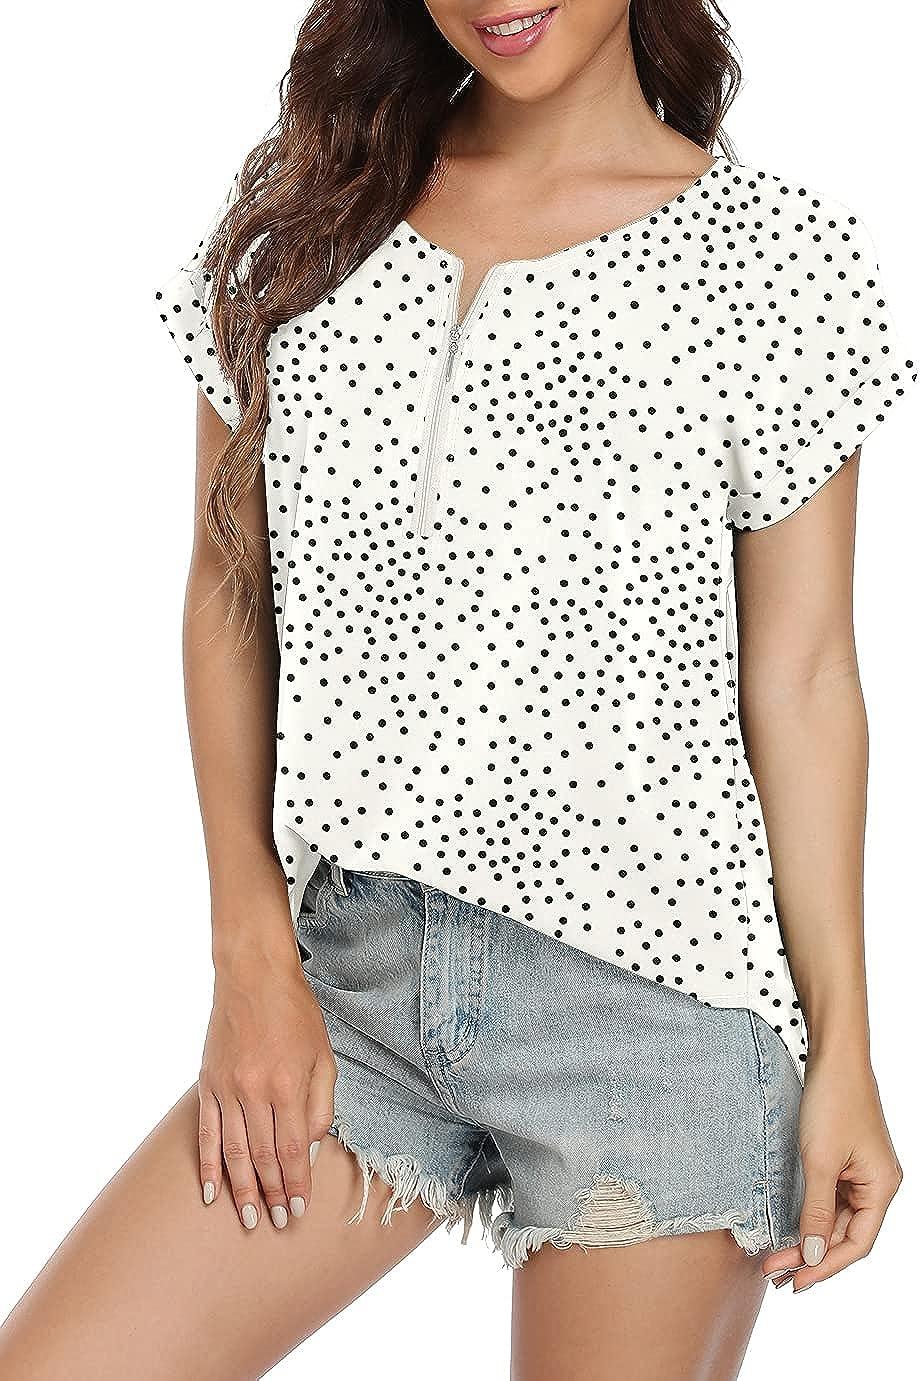 VIISHOW Women's Summer Casual Rolled Cuff Zip Half Placket Chiffon Short Sleeve Top Blouses